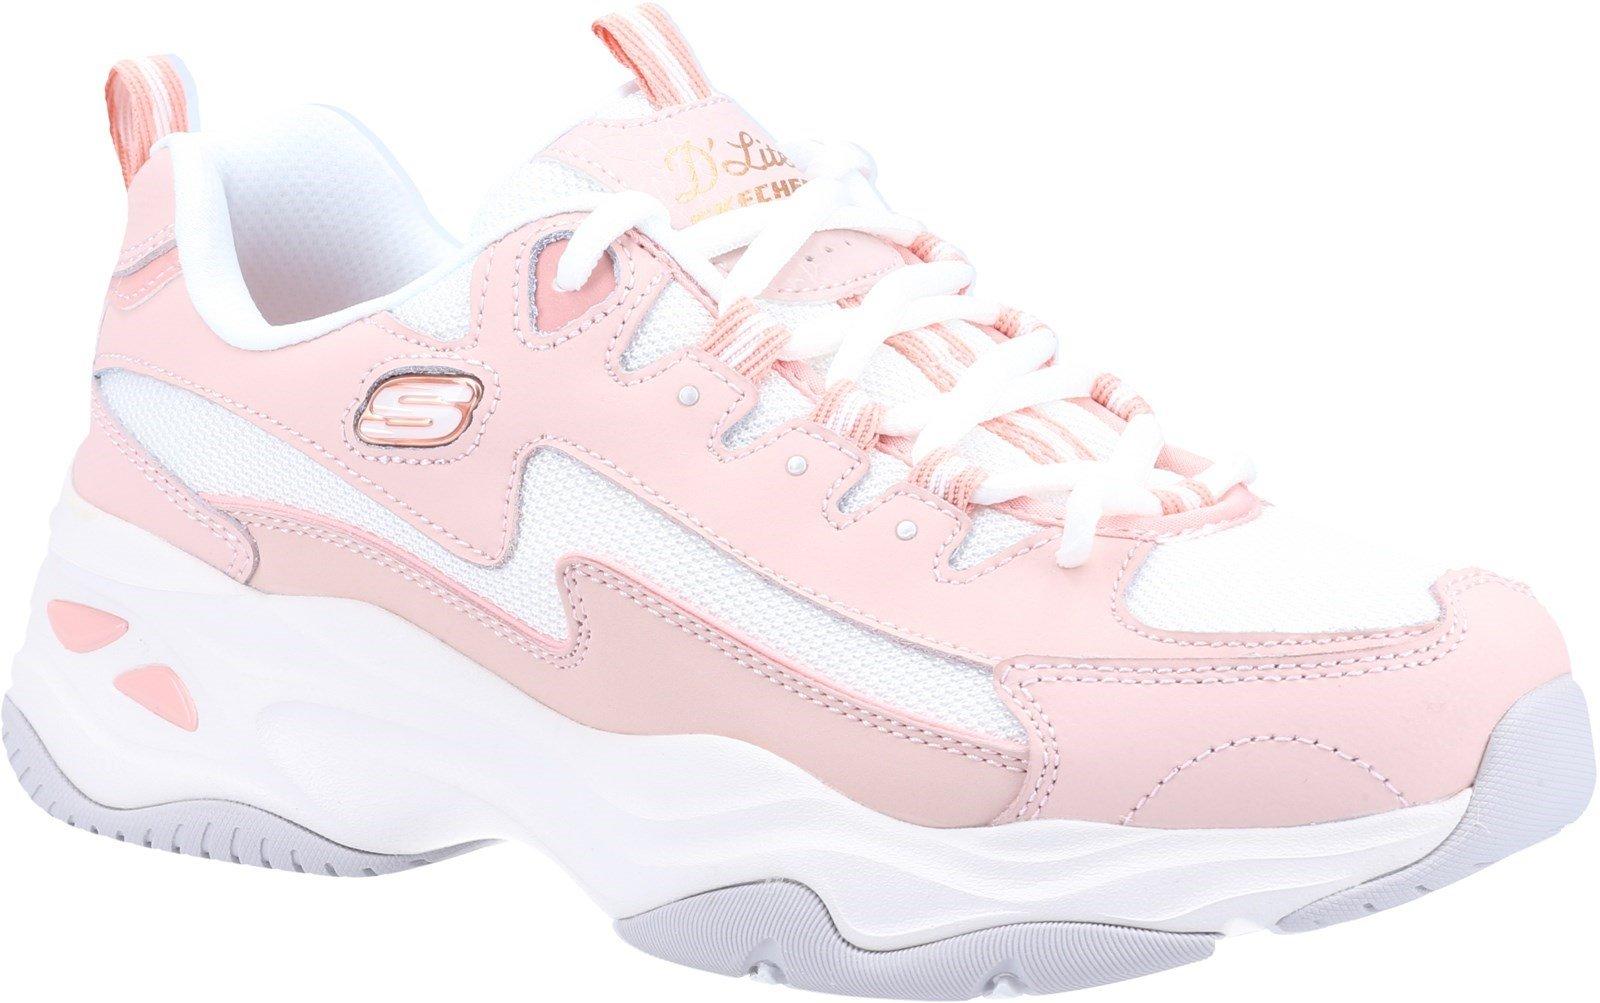 Skechers Women's D'Lites 4.0 Sport Trainer Various Colours 32106 - Light Pink 3